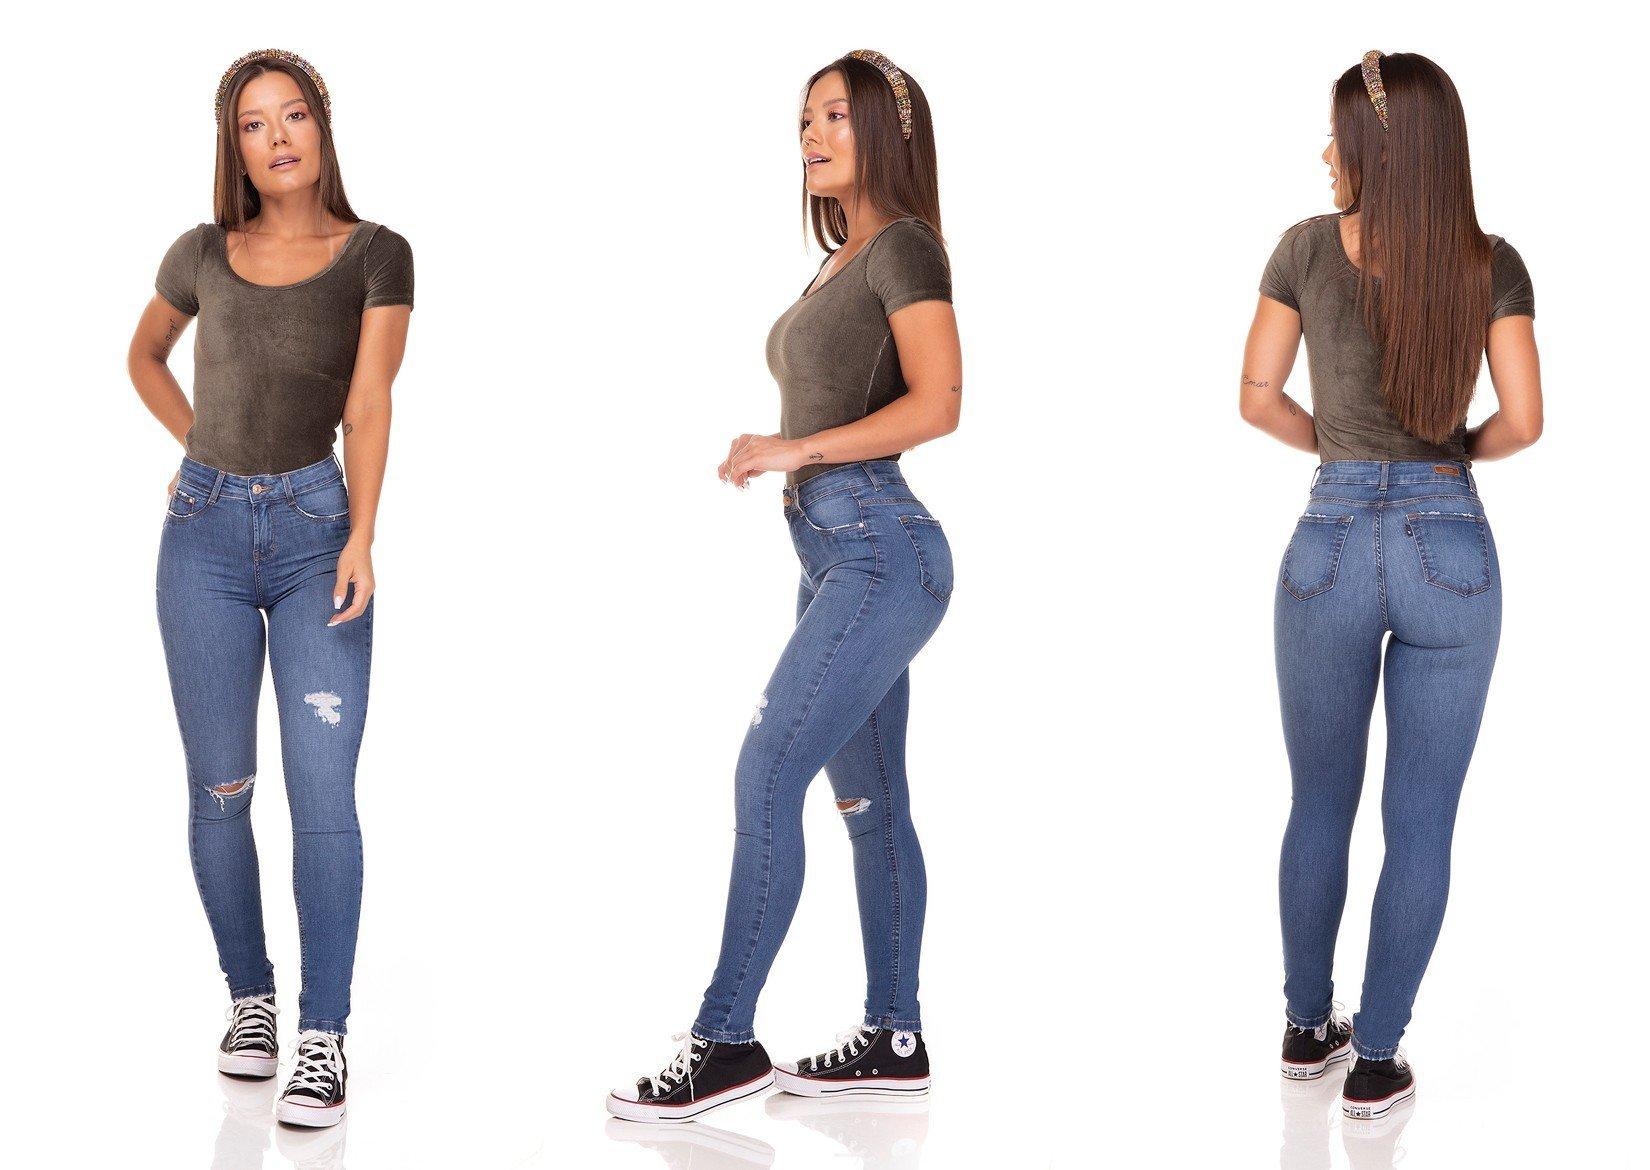 dz3289 calca jeans skinny media cigarrete rasgo no joelho denim zero tripla